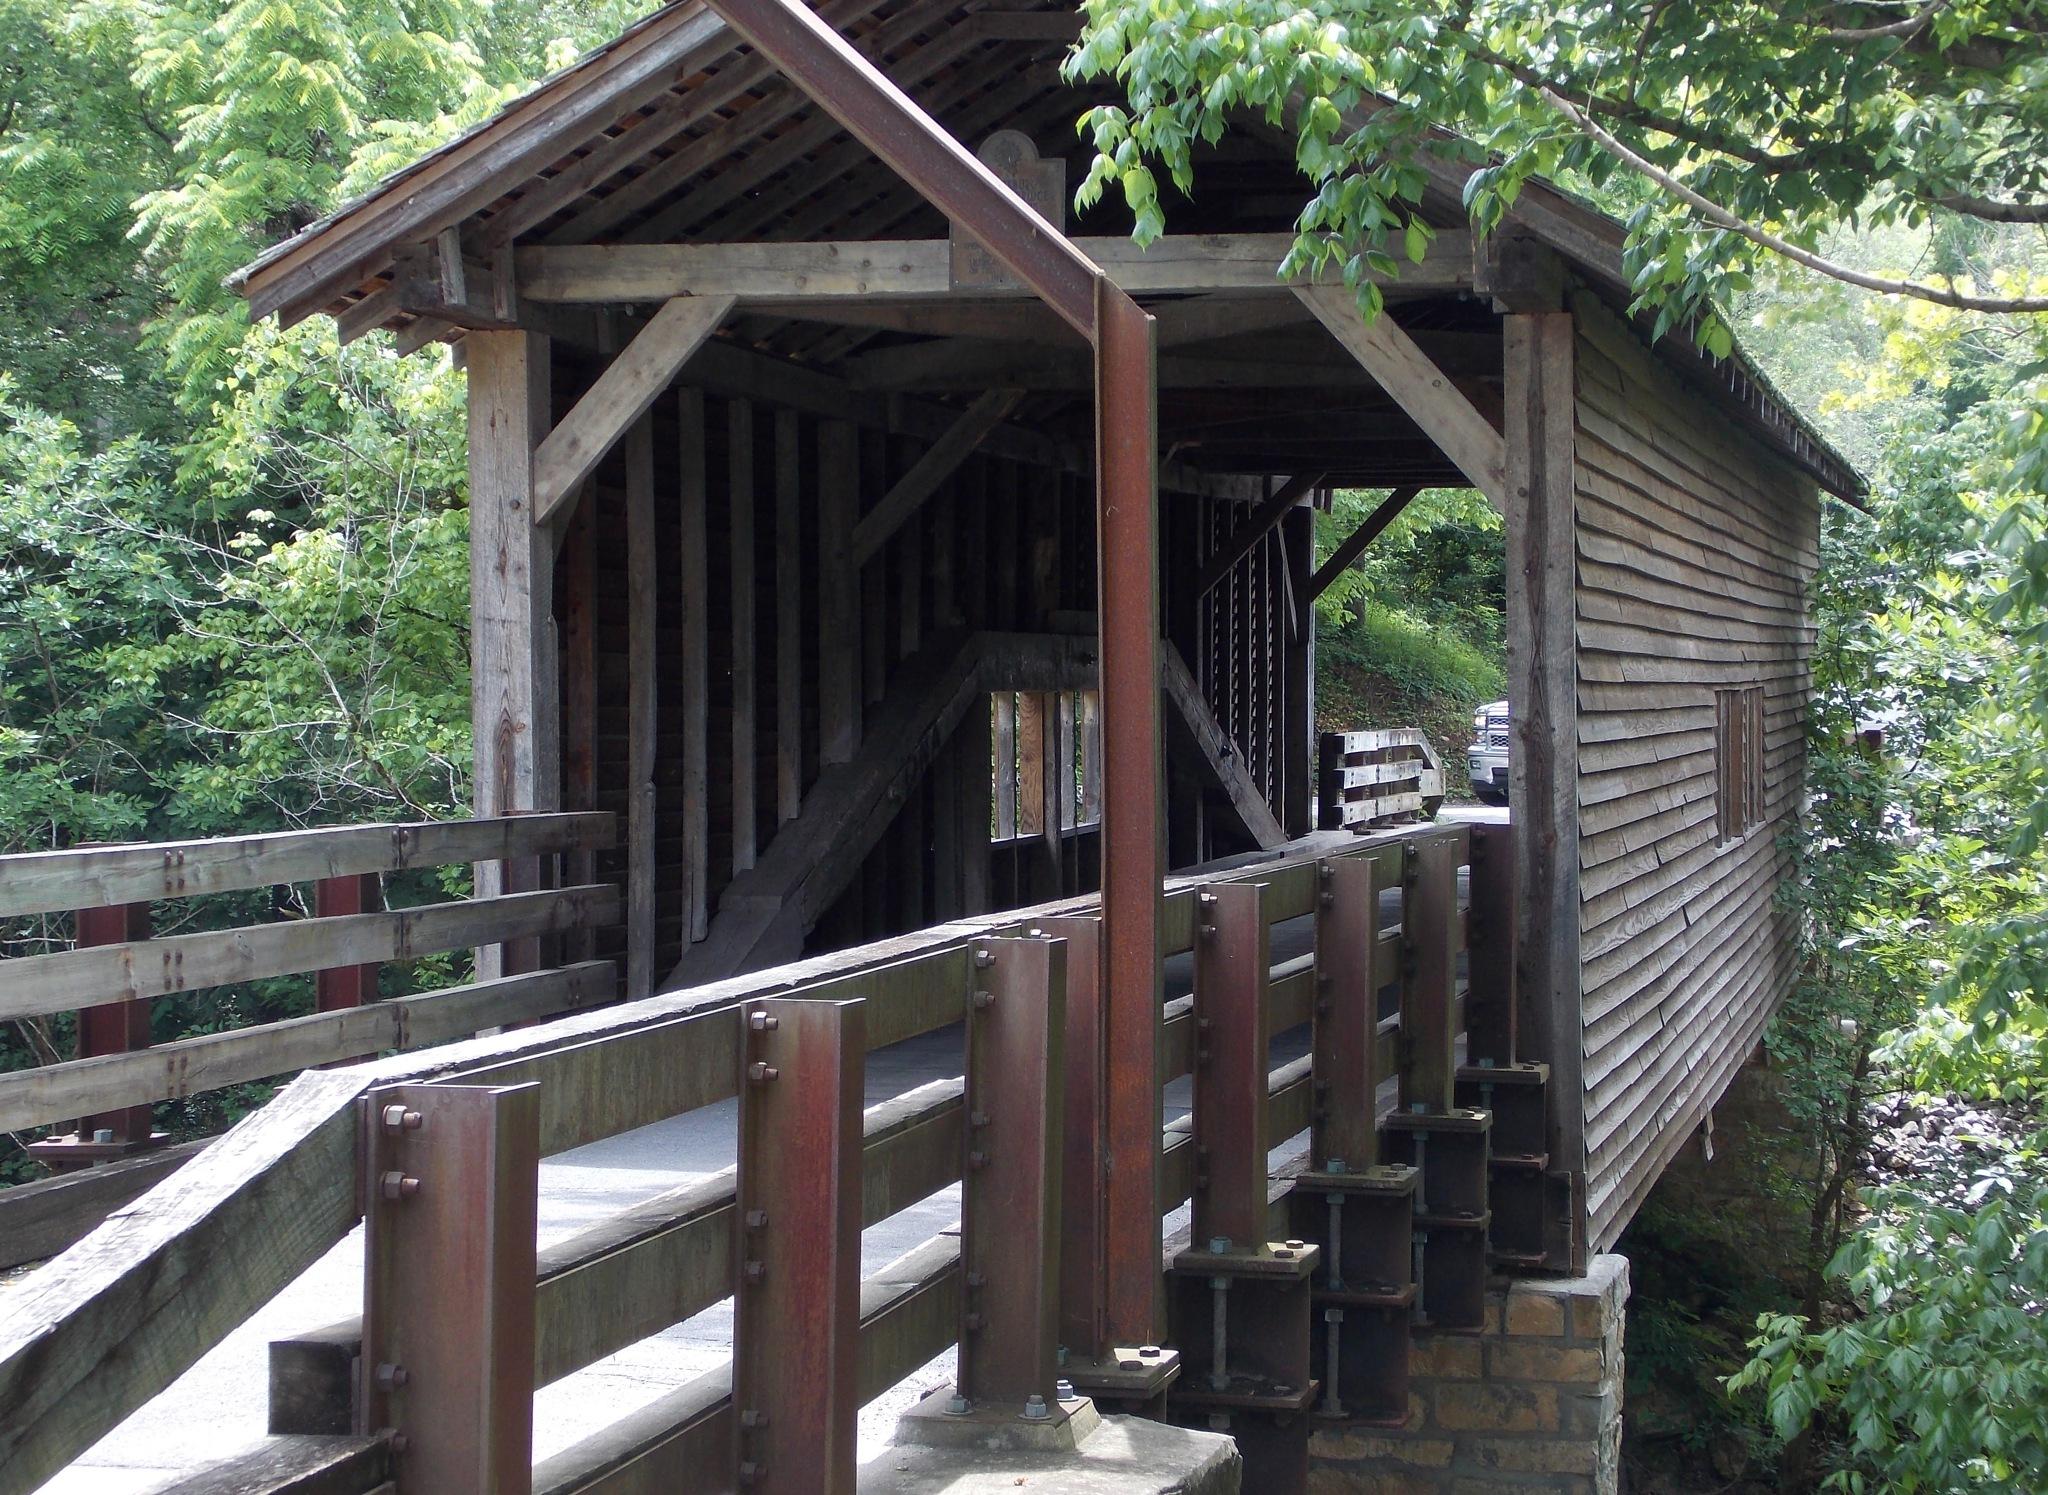 Harrisburg Covered Bridge by Victoria L. Smith